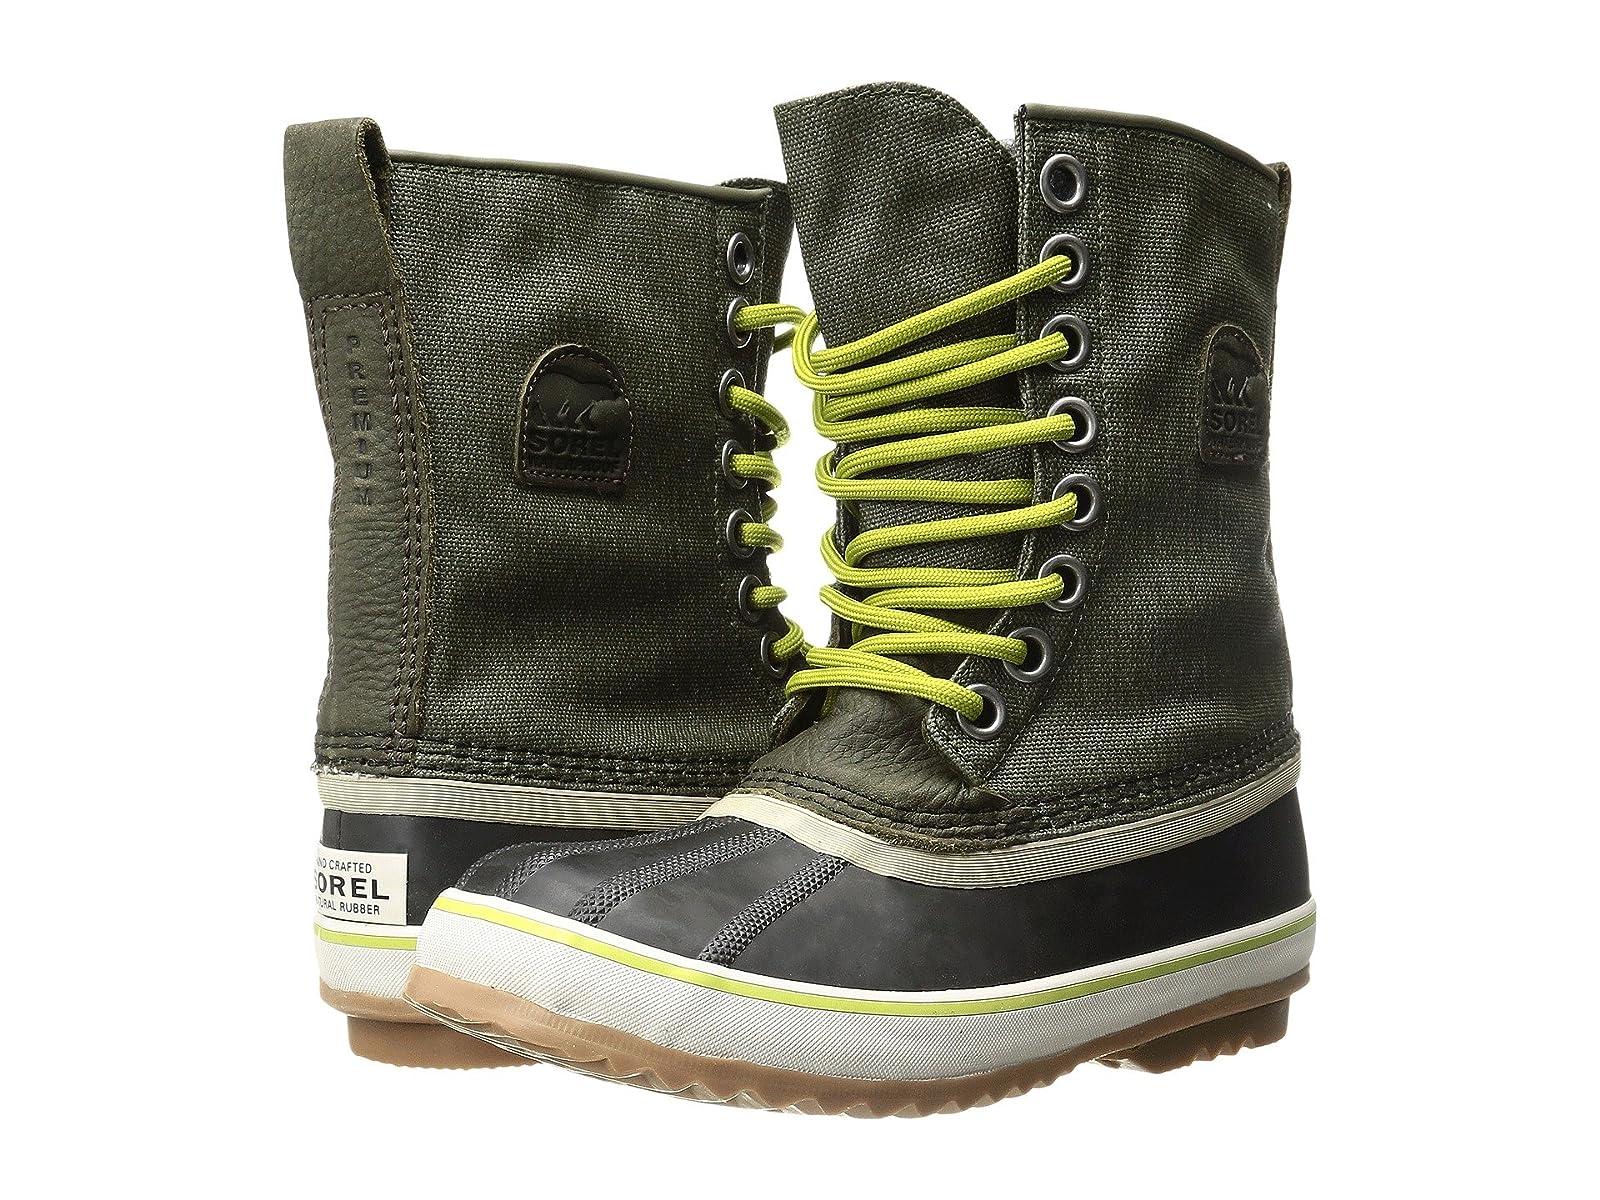 SOREL 1964 Premium™ CVSEconomical and quality shoes